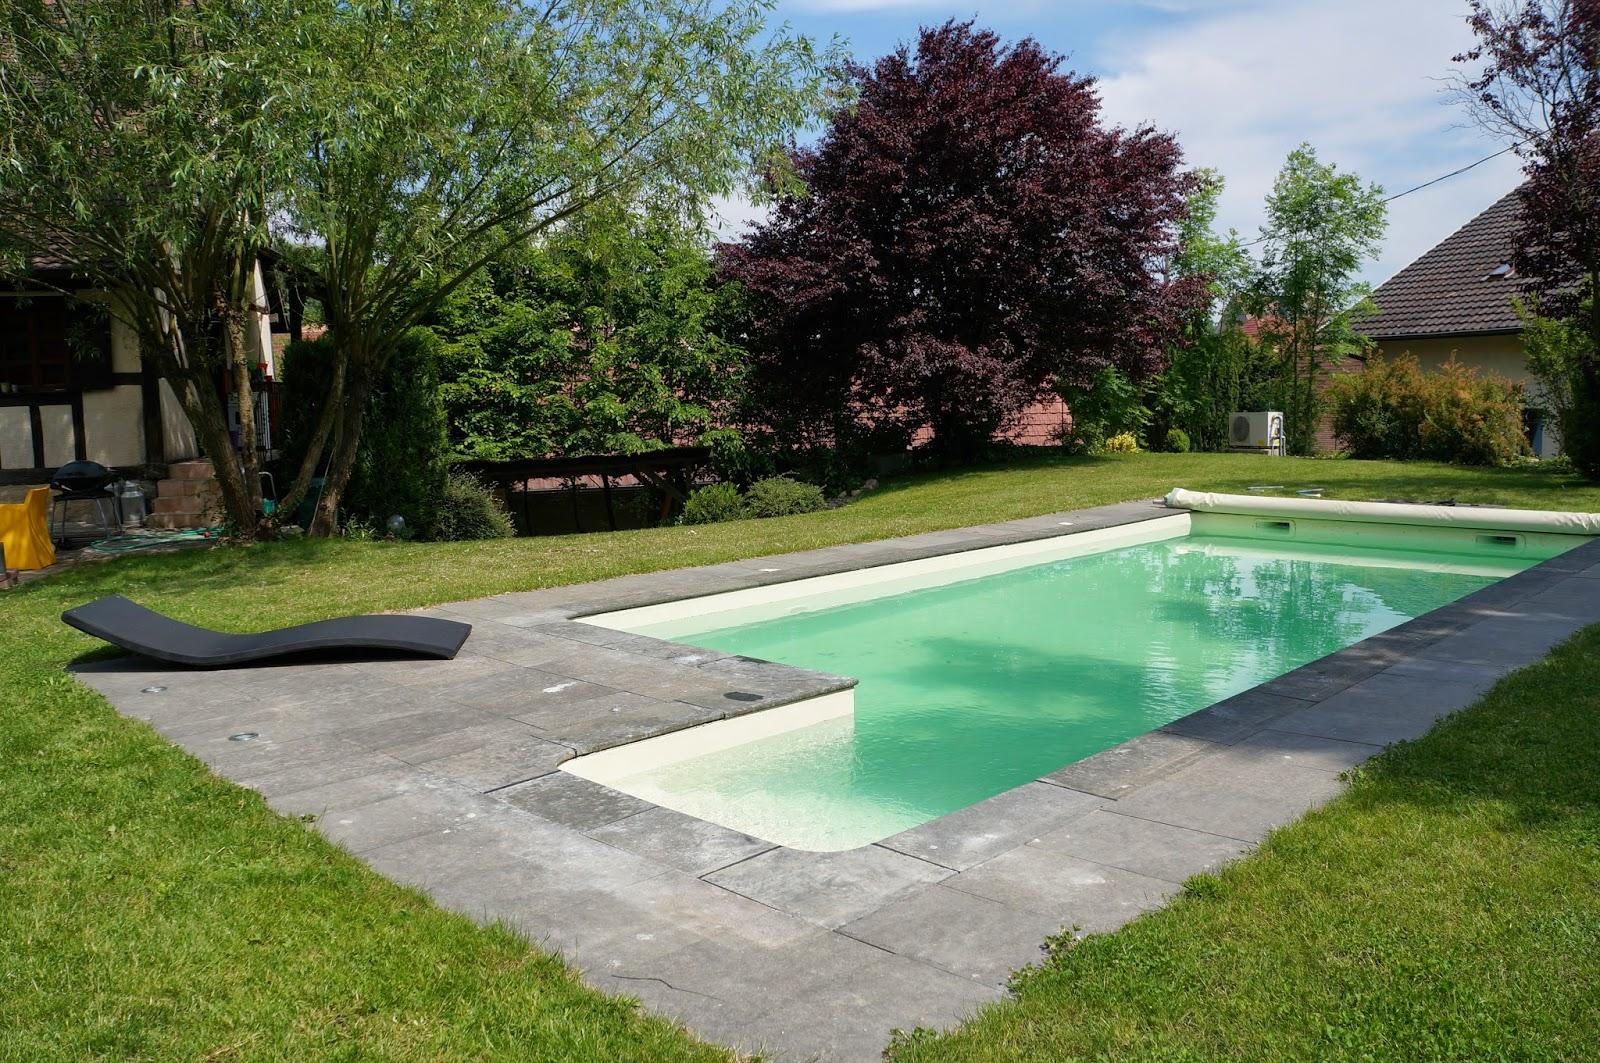 La piscine maison traditionnelle alsacienne steinbrunn for Piscine rectangulaire 1m50